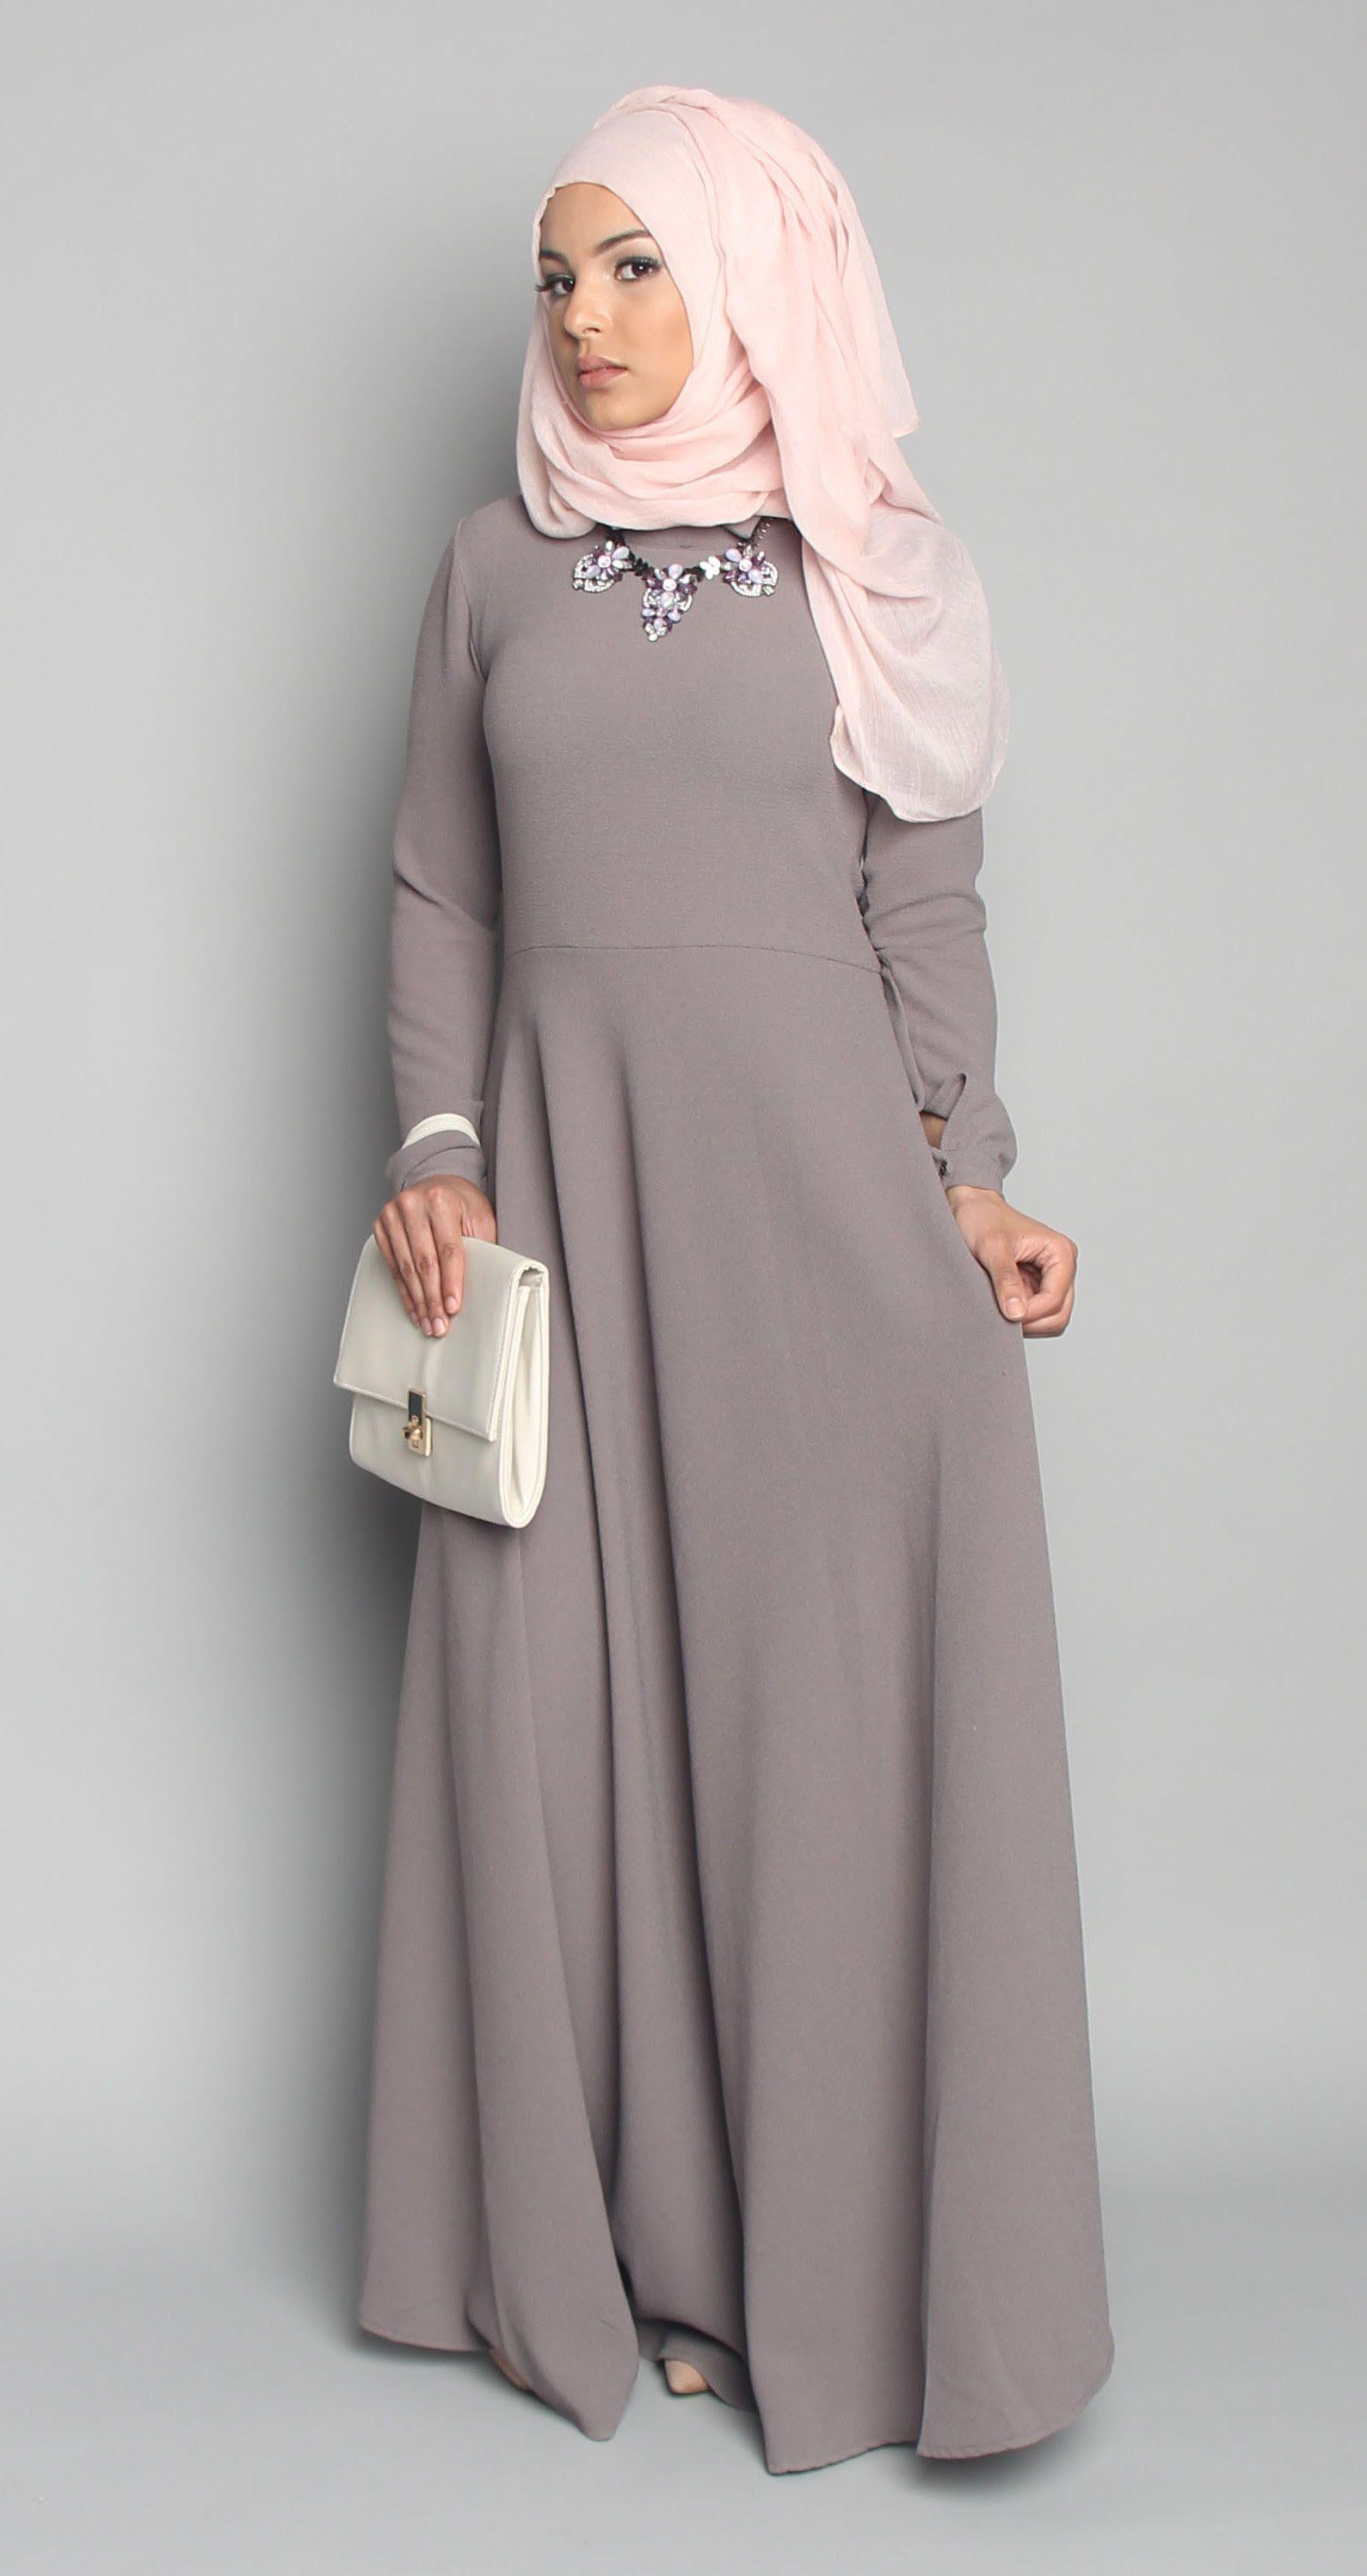 2b5d8f4ff6dbf Hijabi Gowns, Hijab Chic, Hijab Style, Abaya Style, Muslim Fashion, Islamic